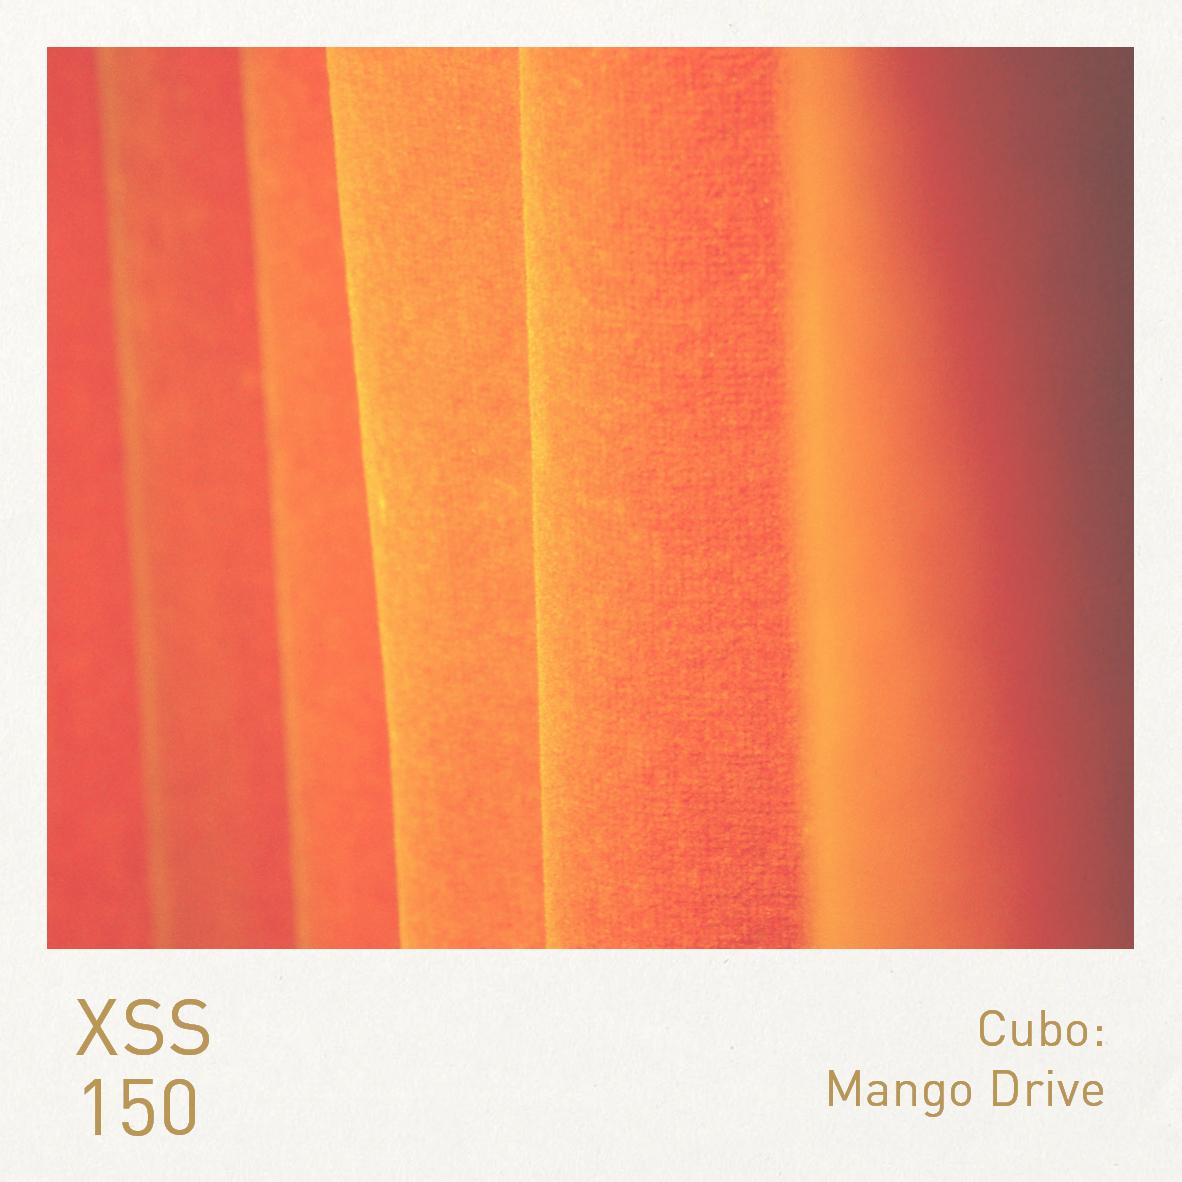 XSS150 | Cubo | Mango Drive